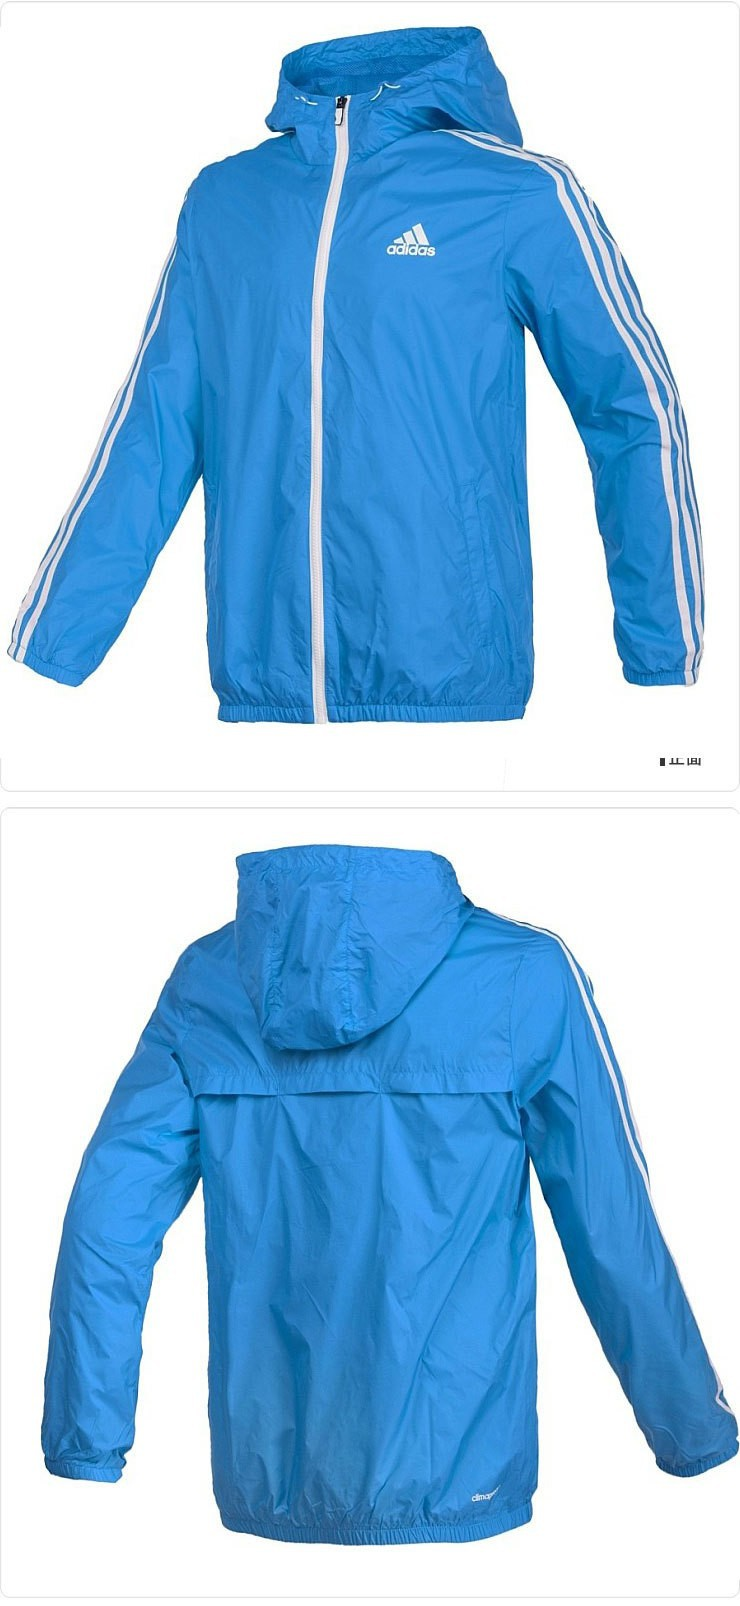 Мужская ветровка Top qualtiy  015 men adidaselieds Hoodies Sweatshirts jackets coat